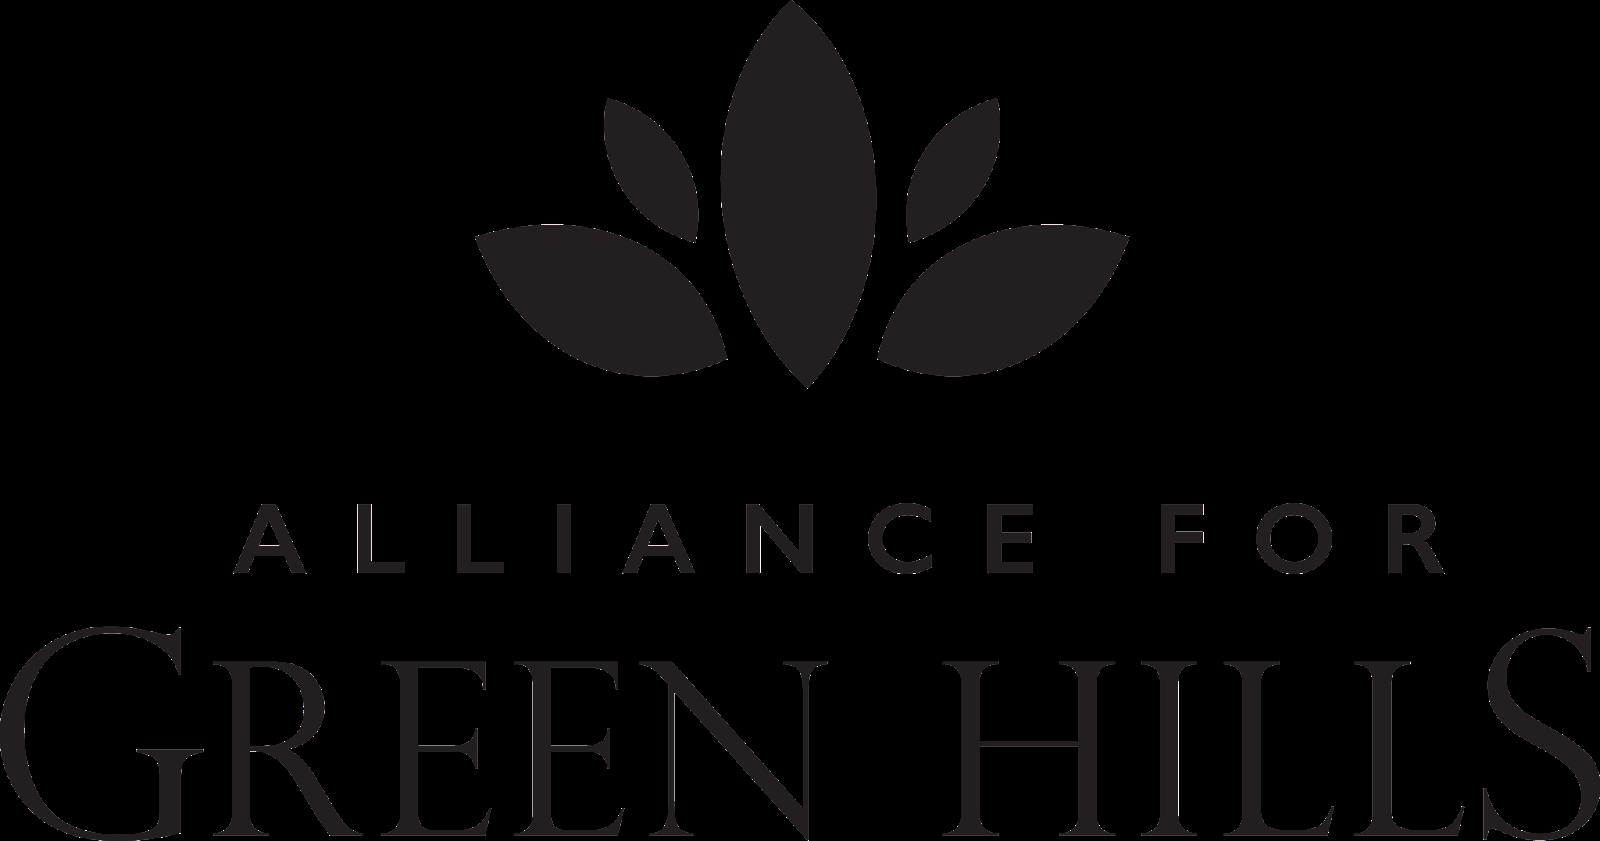 Alliance4GreenHills_Logo_Black.png